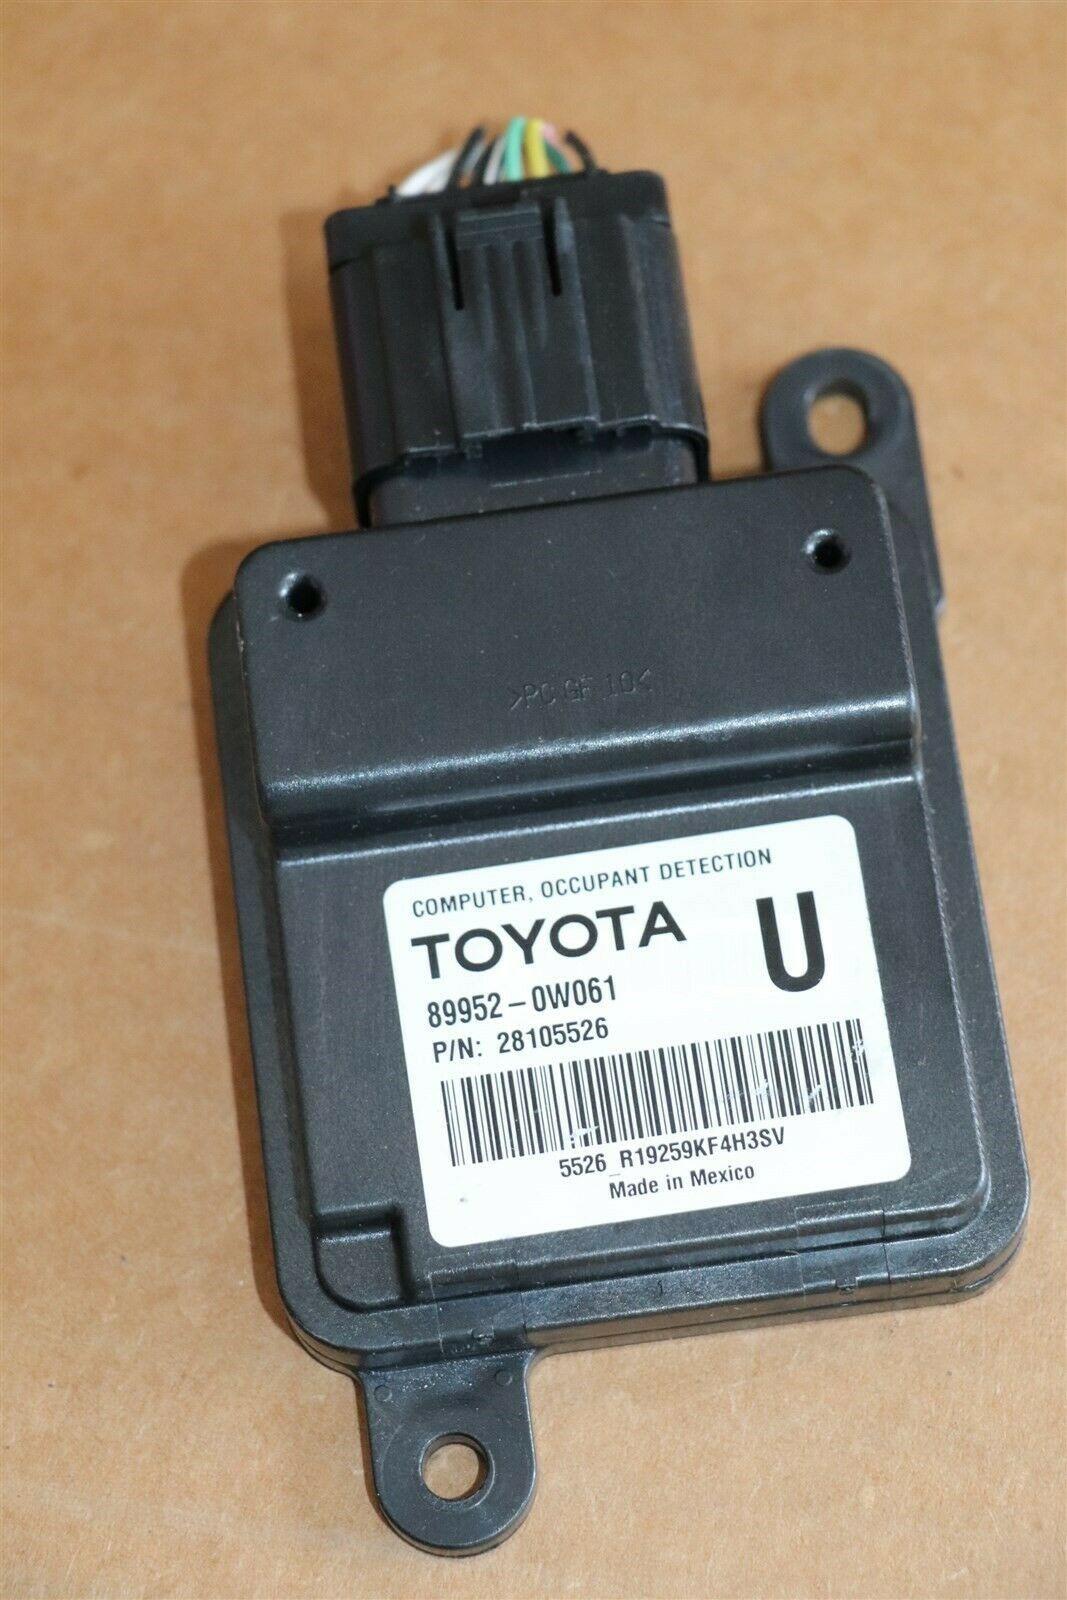 Lexus Toyota Occupant Detection Sensor Module Computer 89952-0w061